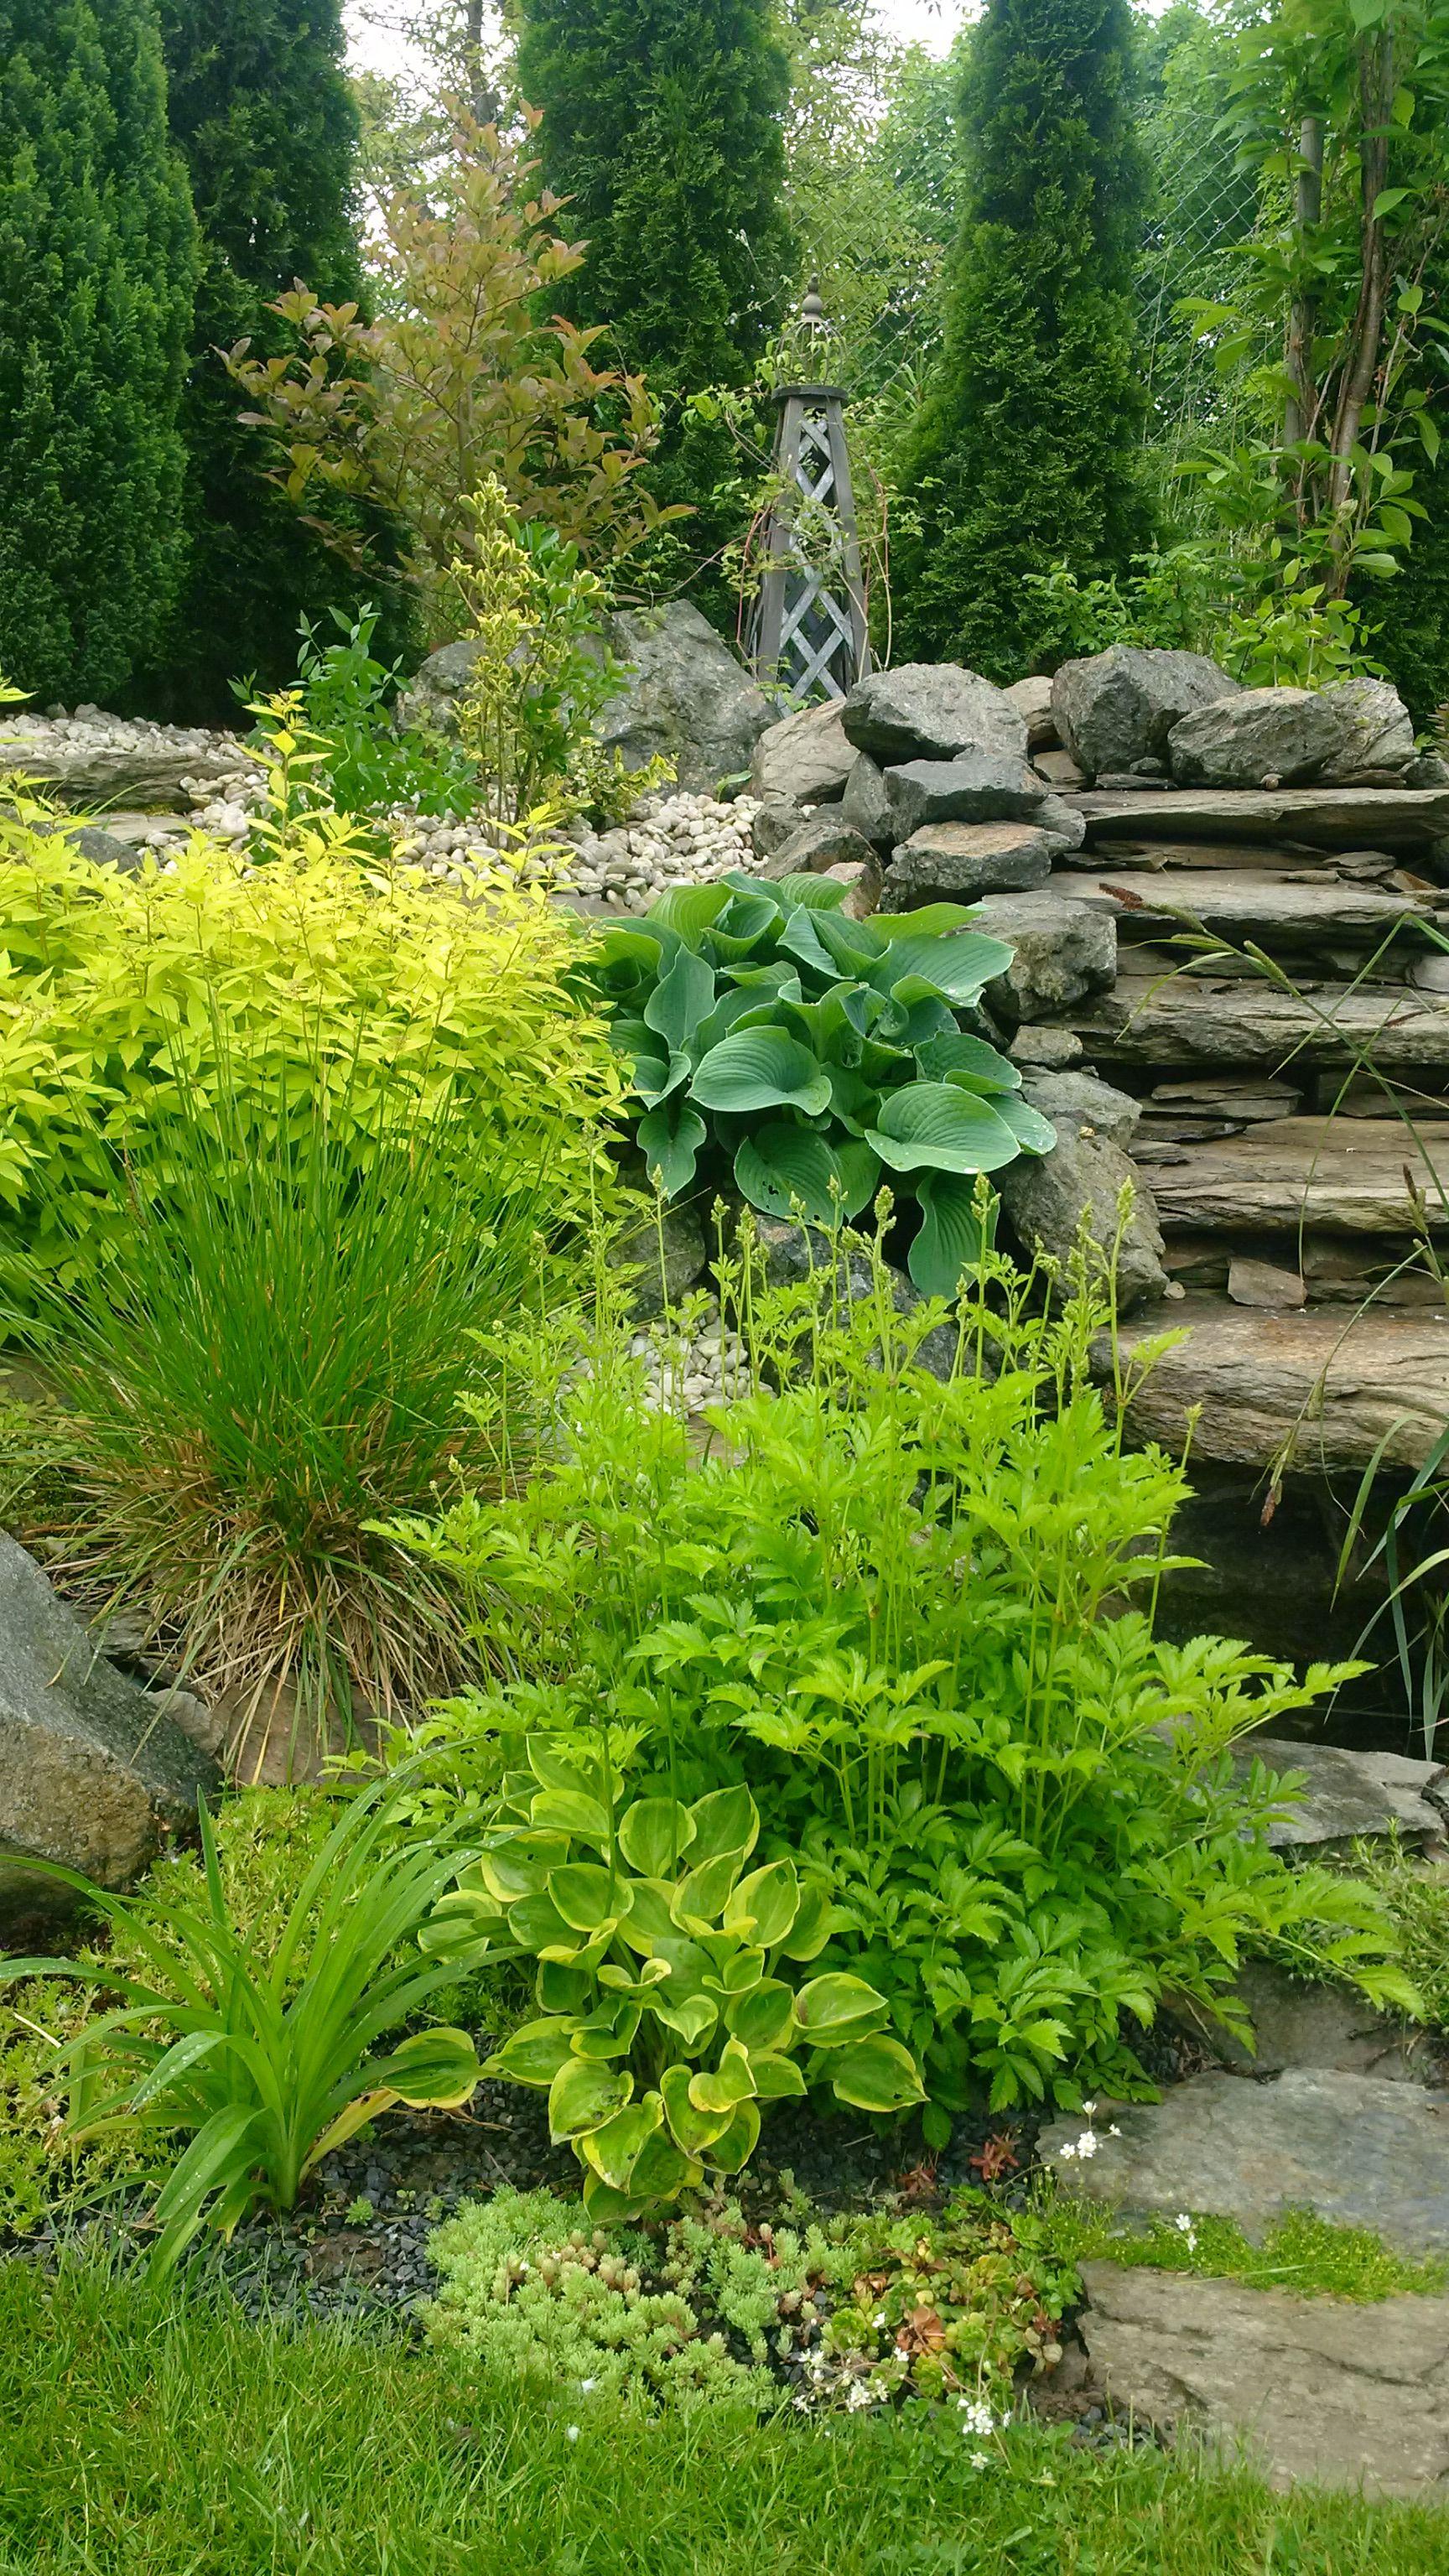 Garten Gestalten, Pflanzen, Garten Am Hügel, Garten Pflaster, Waldgarten,  Landschafts Design, Zen Gärten, Schattengarten, Container Garten